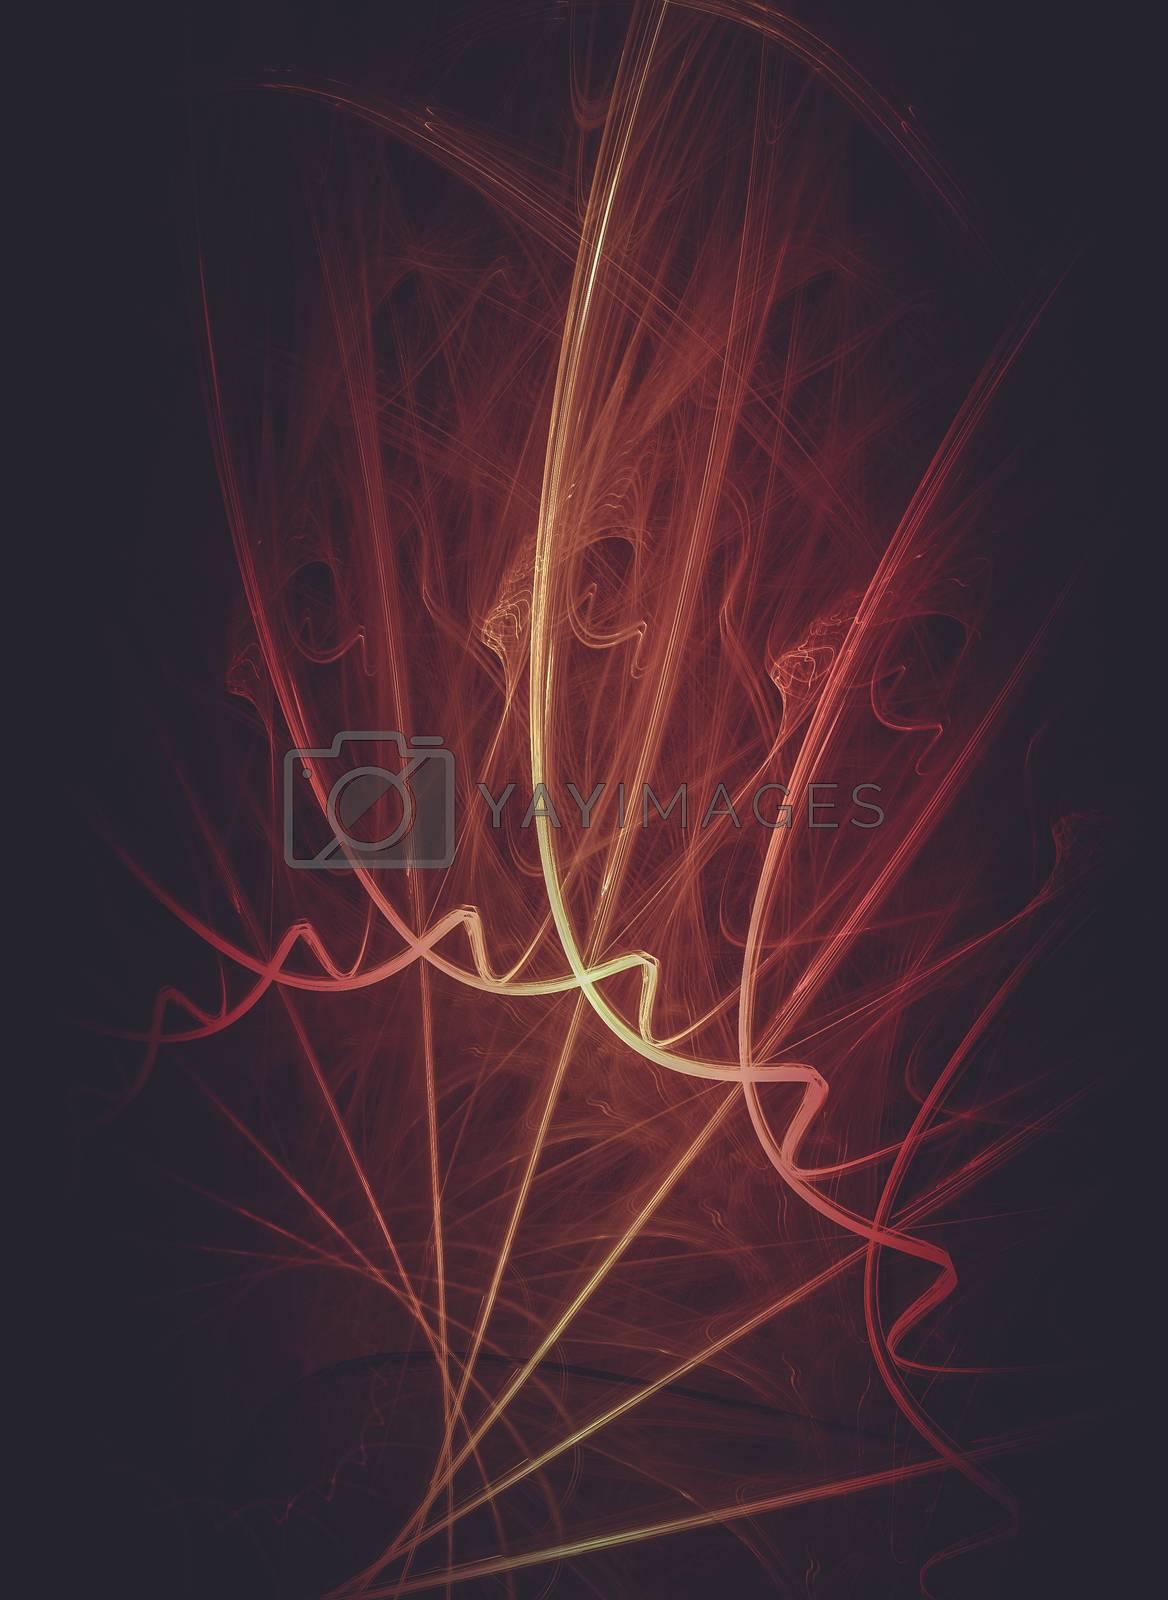 Creative design background, fractal styles with color design  by FernandoCortes